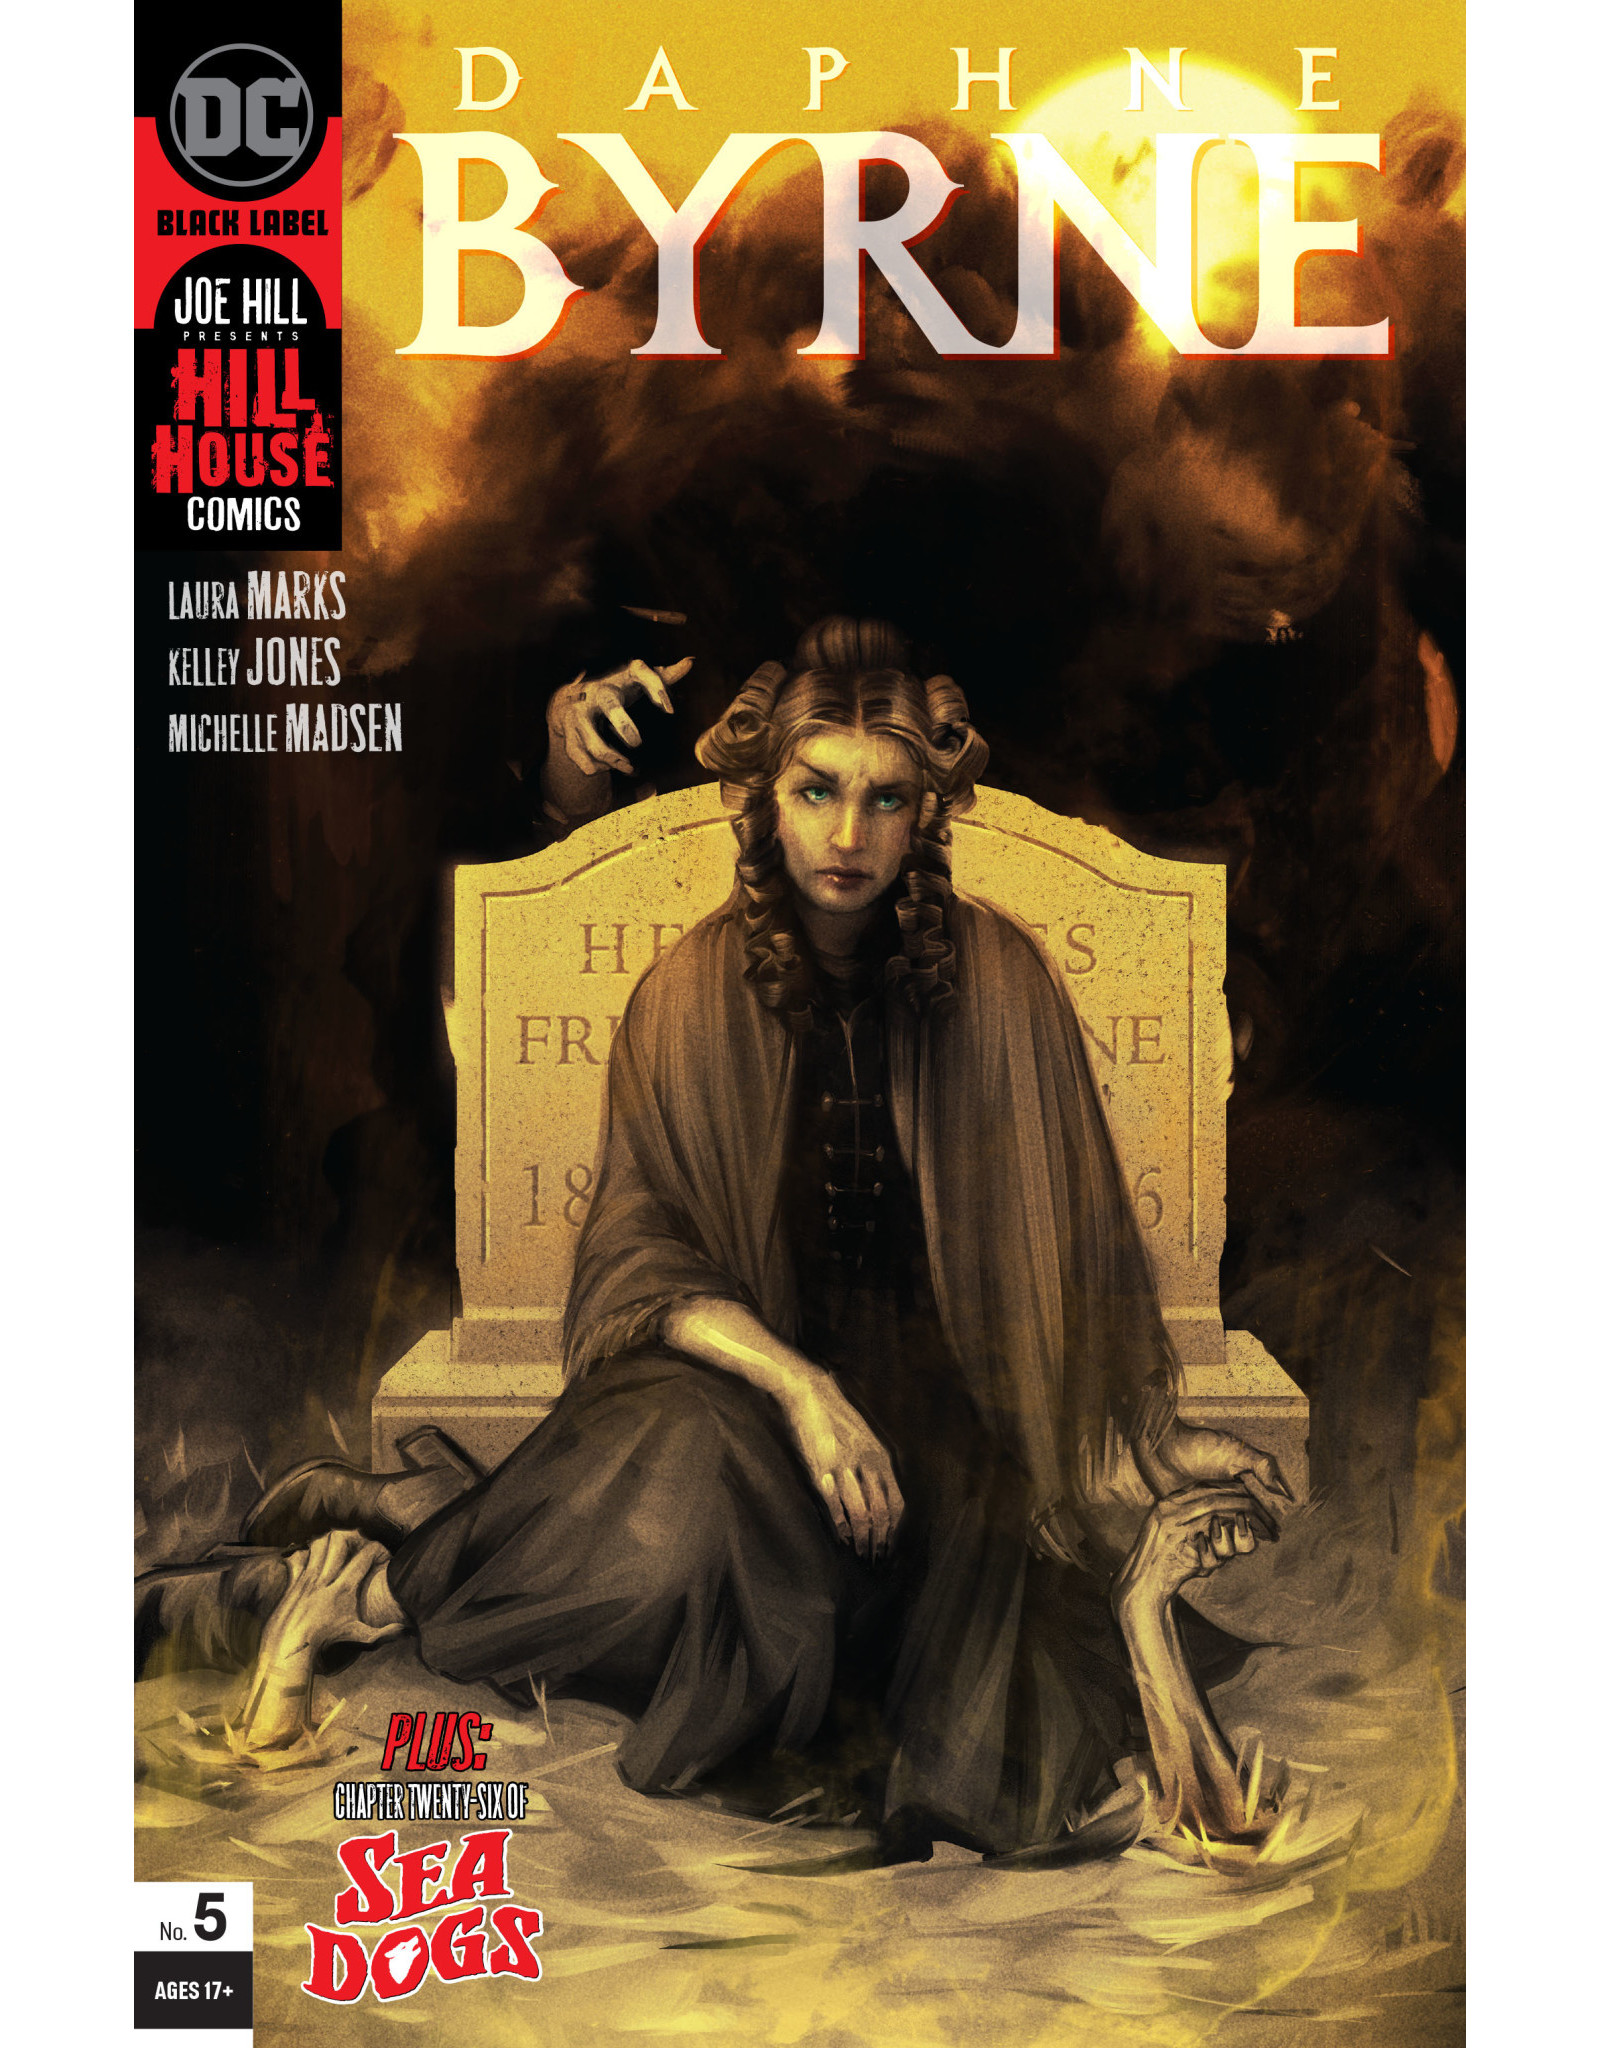 DC COMICS DAPHNE BYRNE #5 (OF 6)